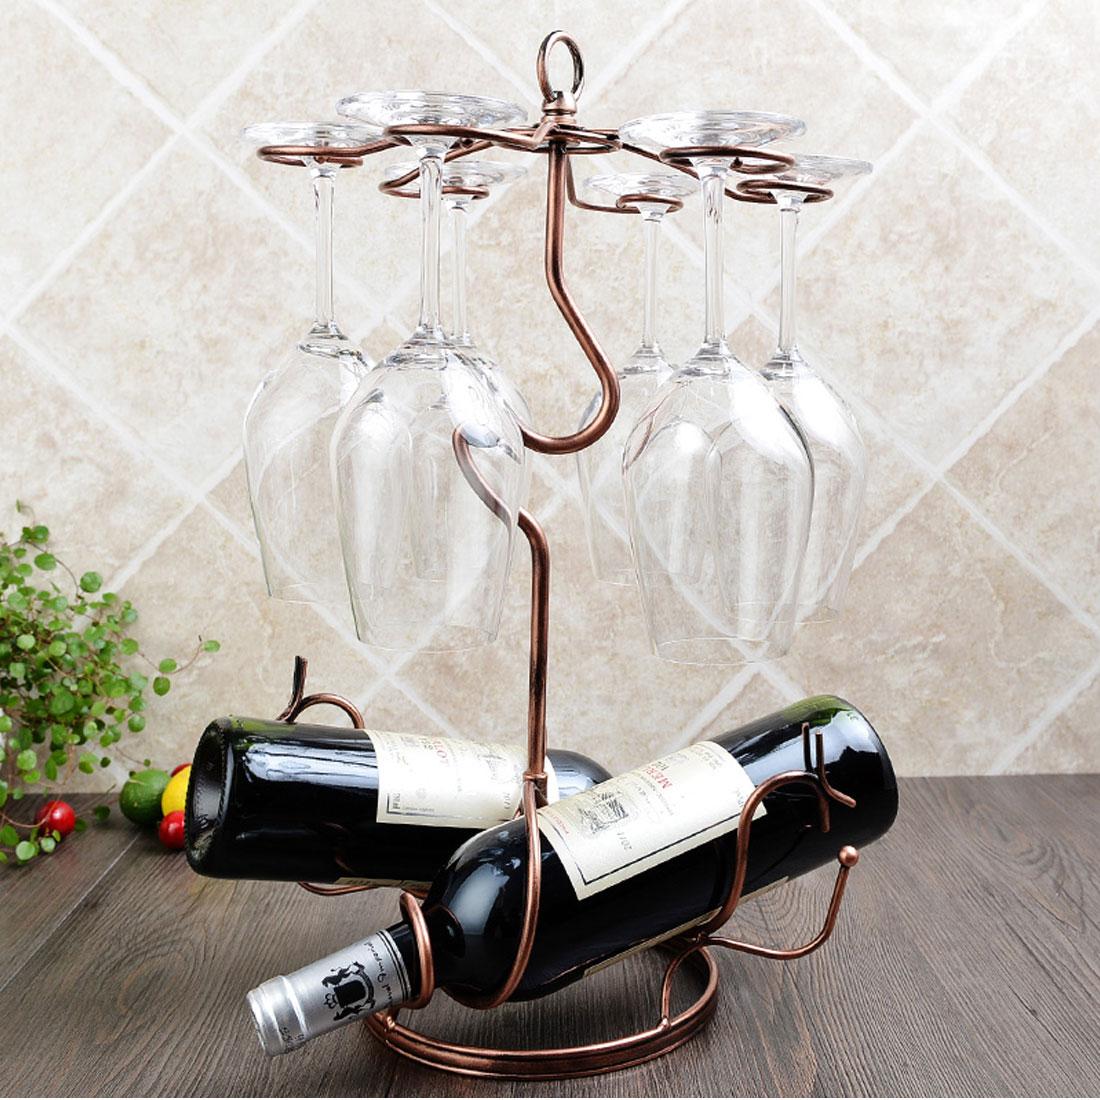 Metal Tabletop 6 Wine Glass Drying Rack Holder Display Stand 46x26cm Brass Tone 5